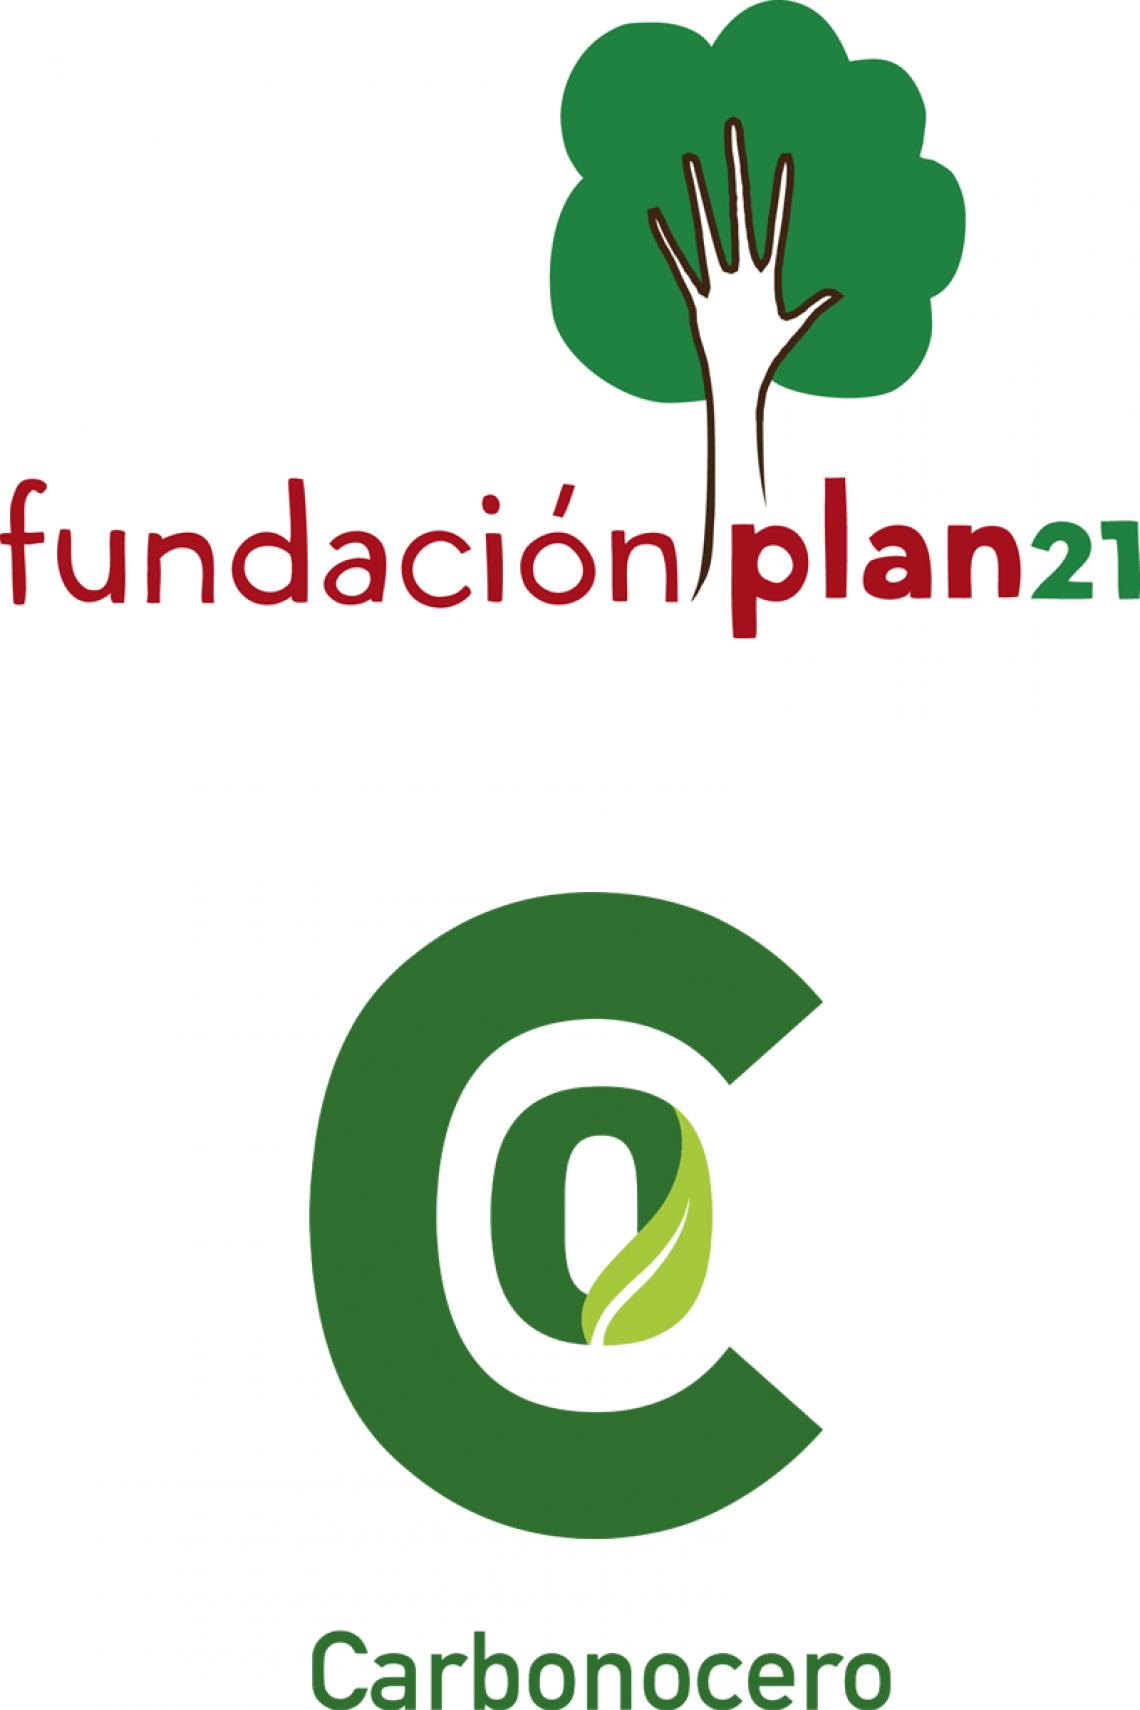 Logo Plan 21 / Carboncero